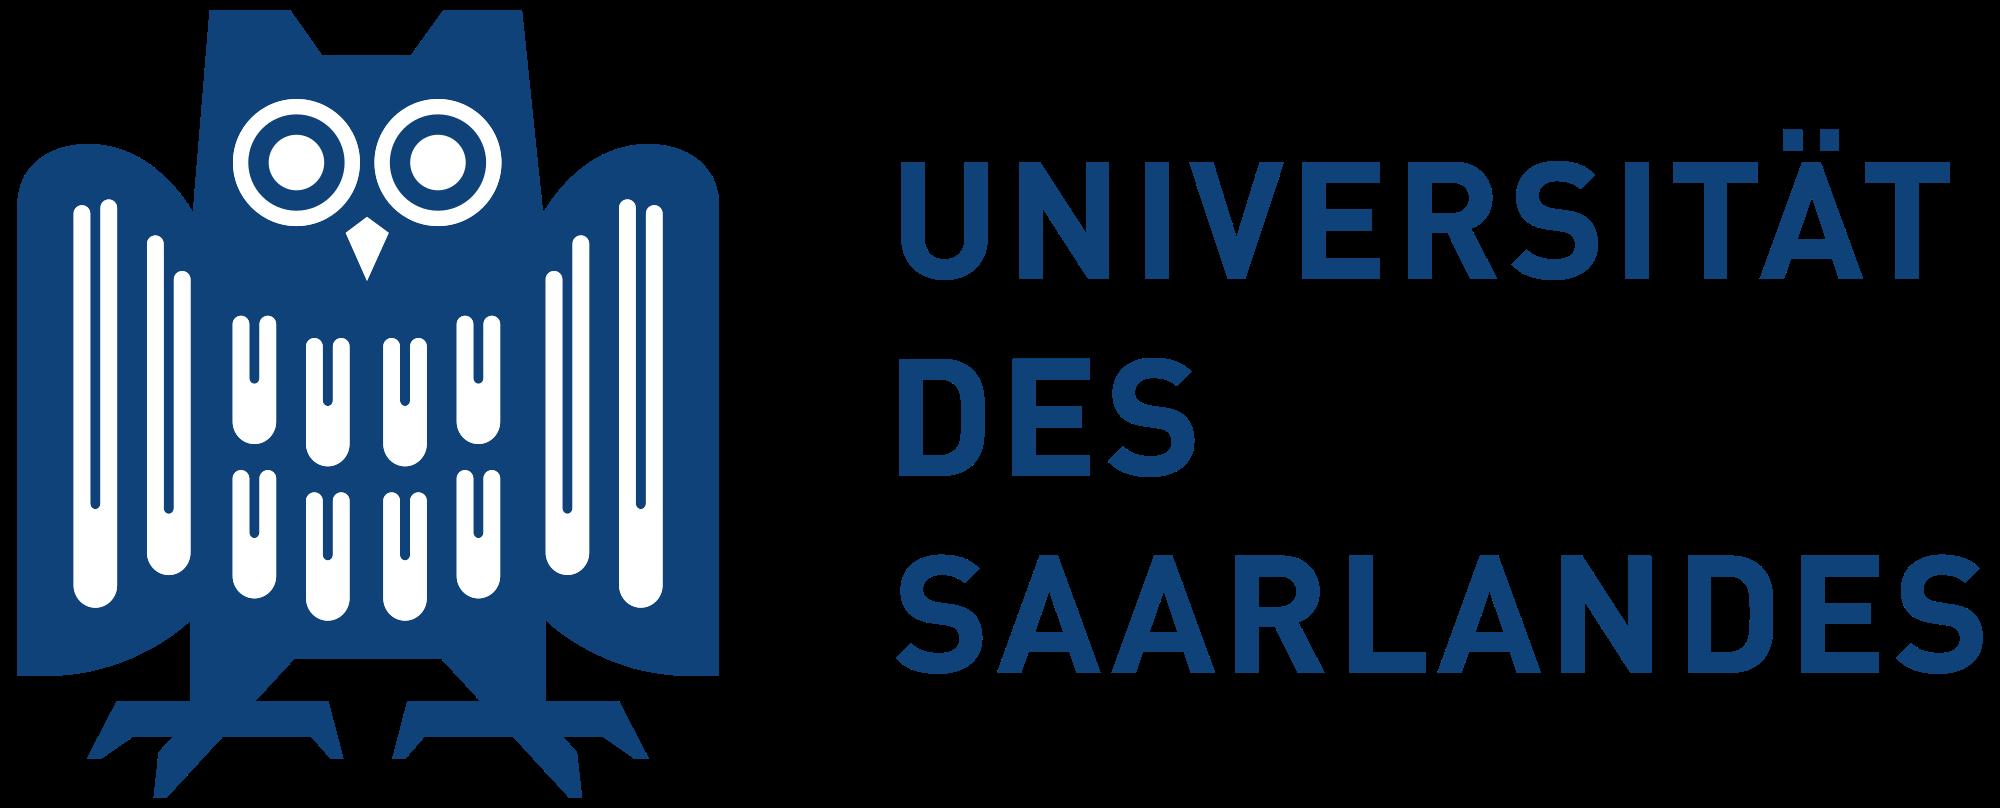 Saarland University Logo